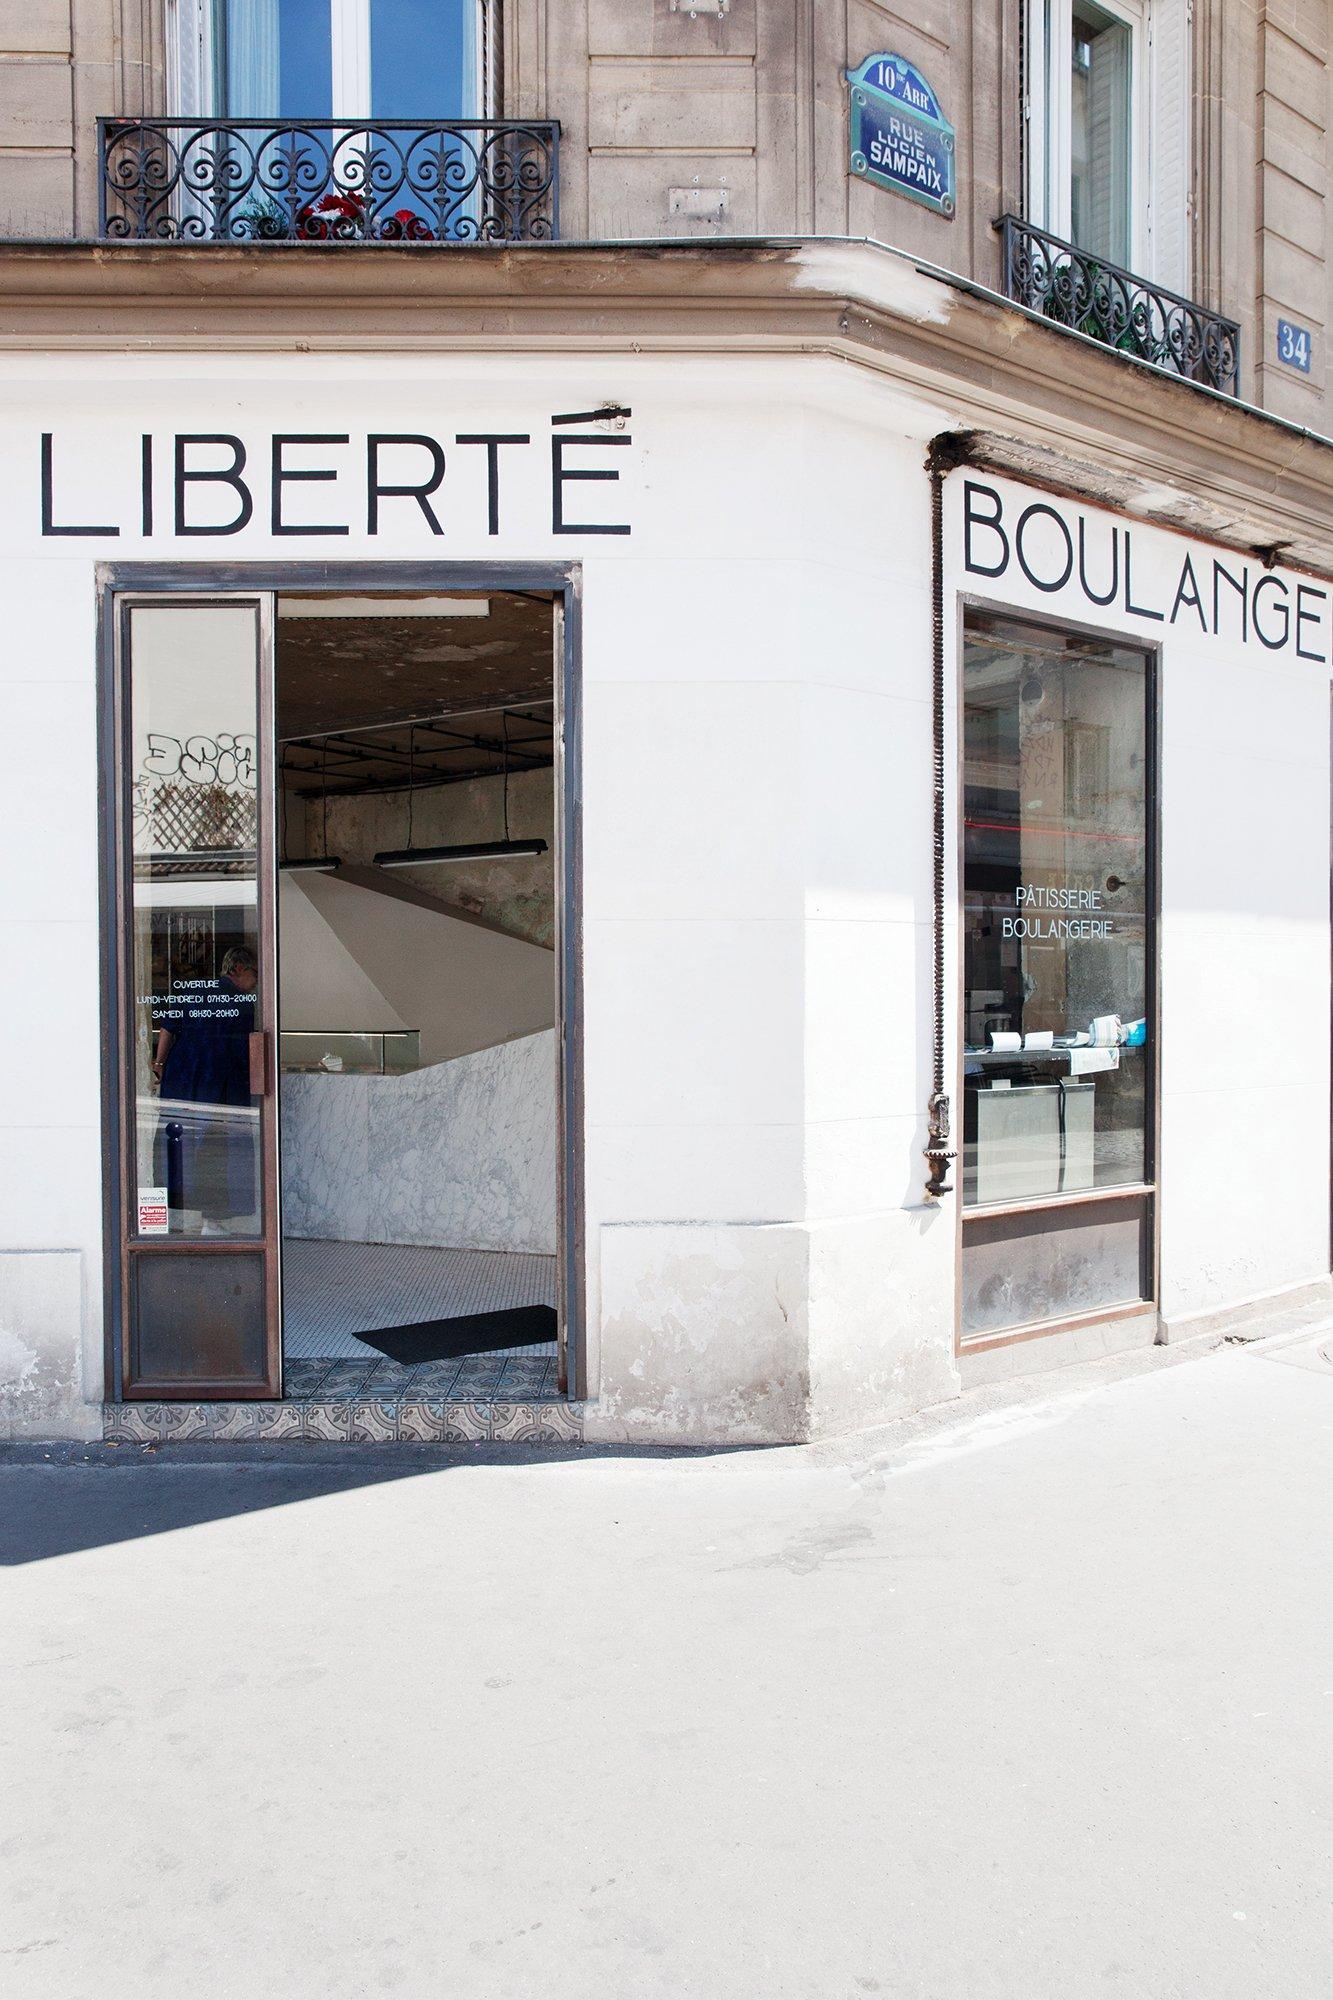 Façade Extérieure Liberté pâtisserie boulangerie Mickael Benichou